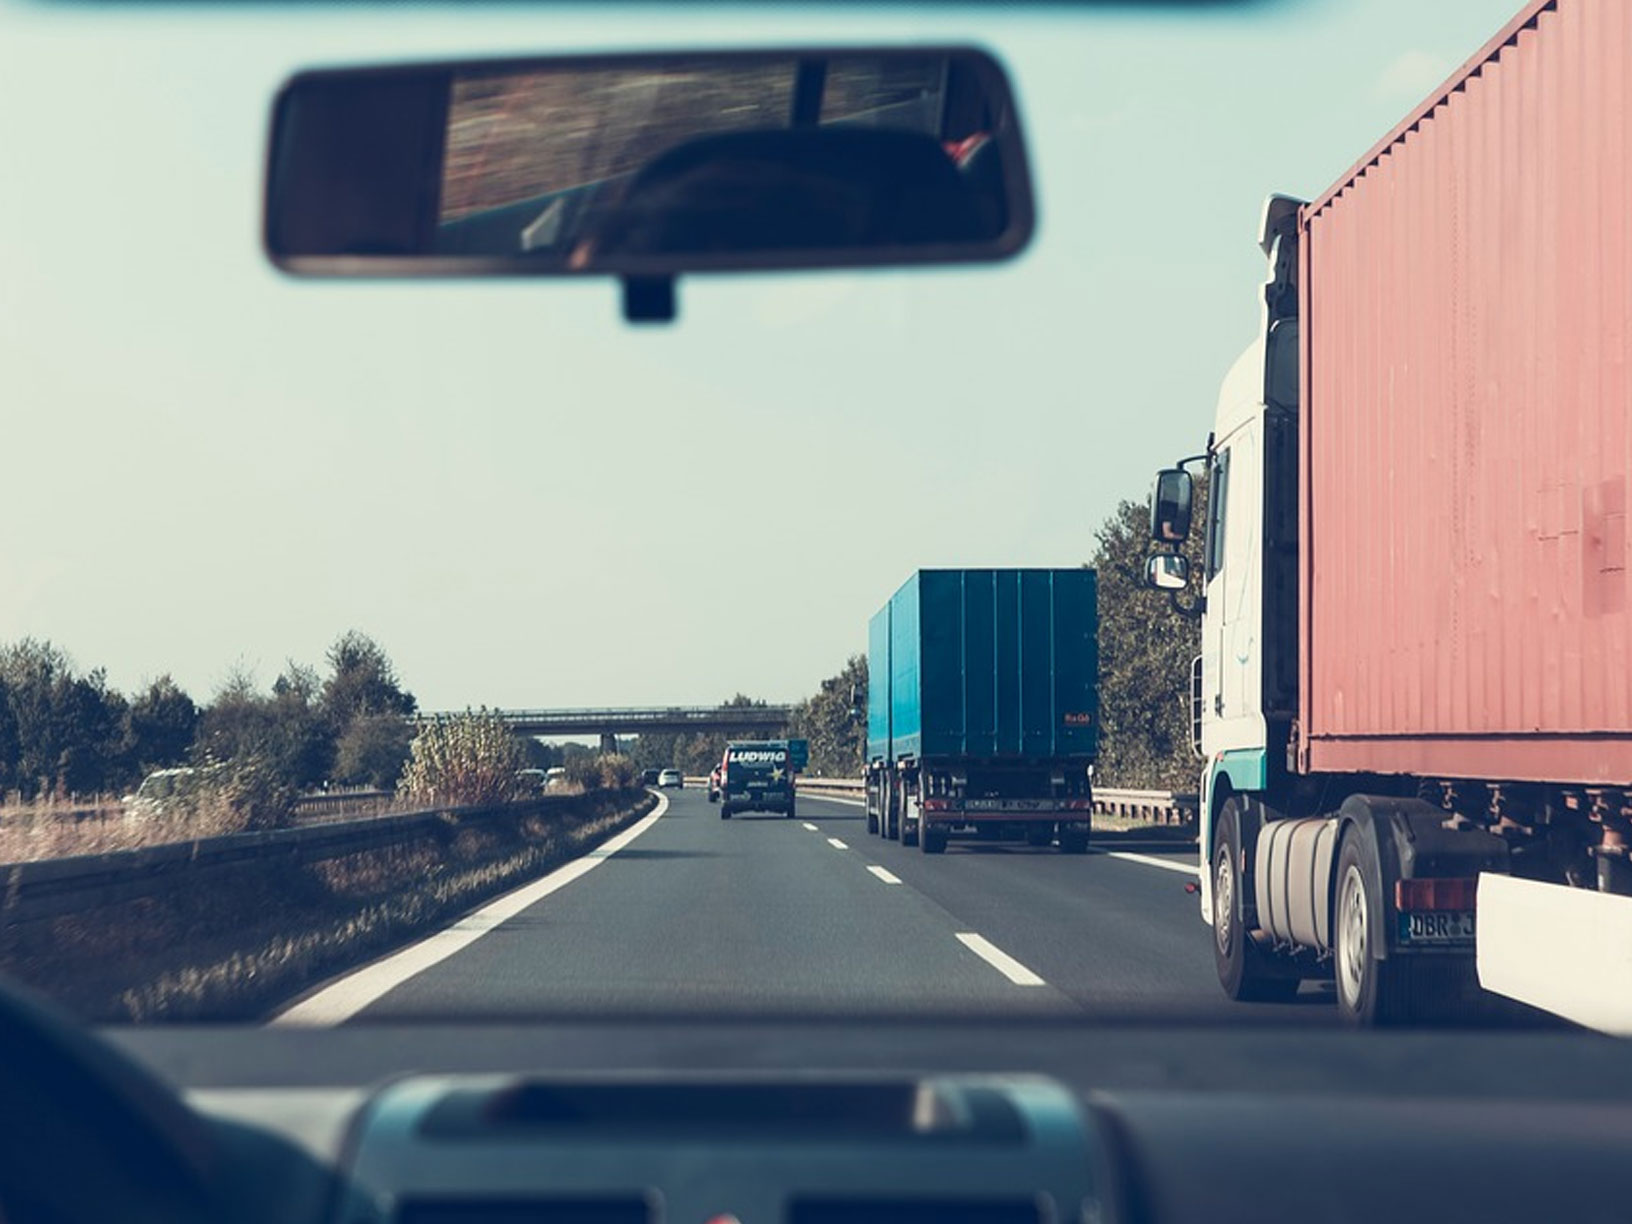 berufskraftfahrerausbildung1-1632x1224